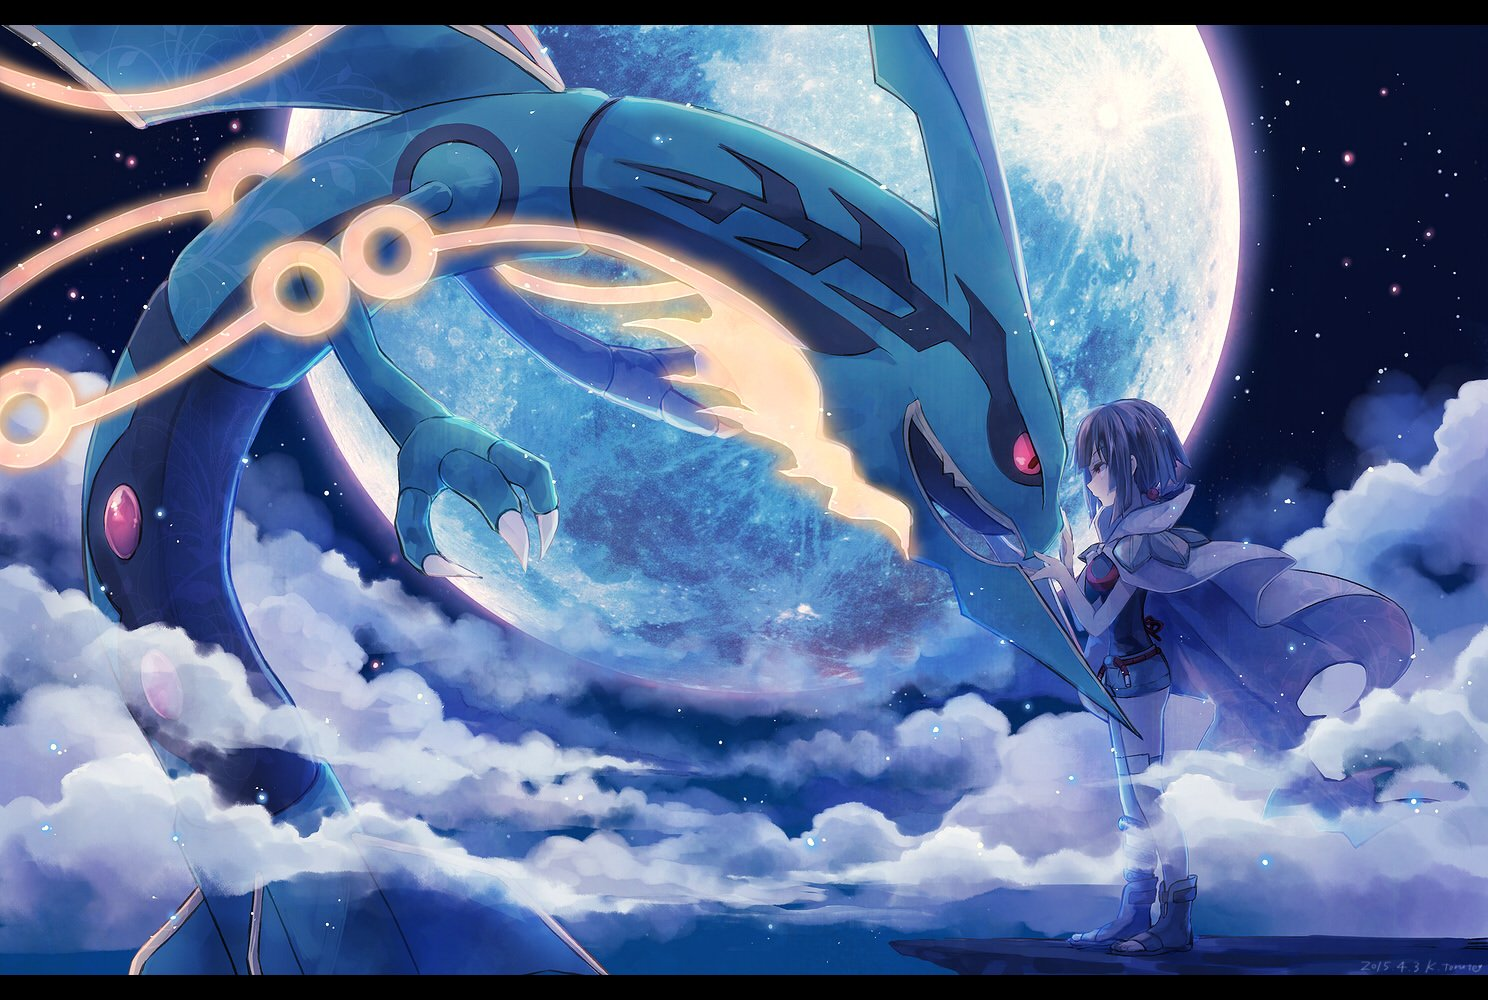 Higana Pokemon Pokemon Rayquaza Torute Wallpaper 1488x1000 704888 Wallpaperup